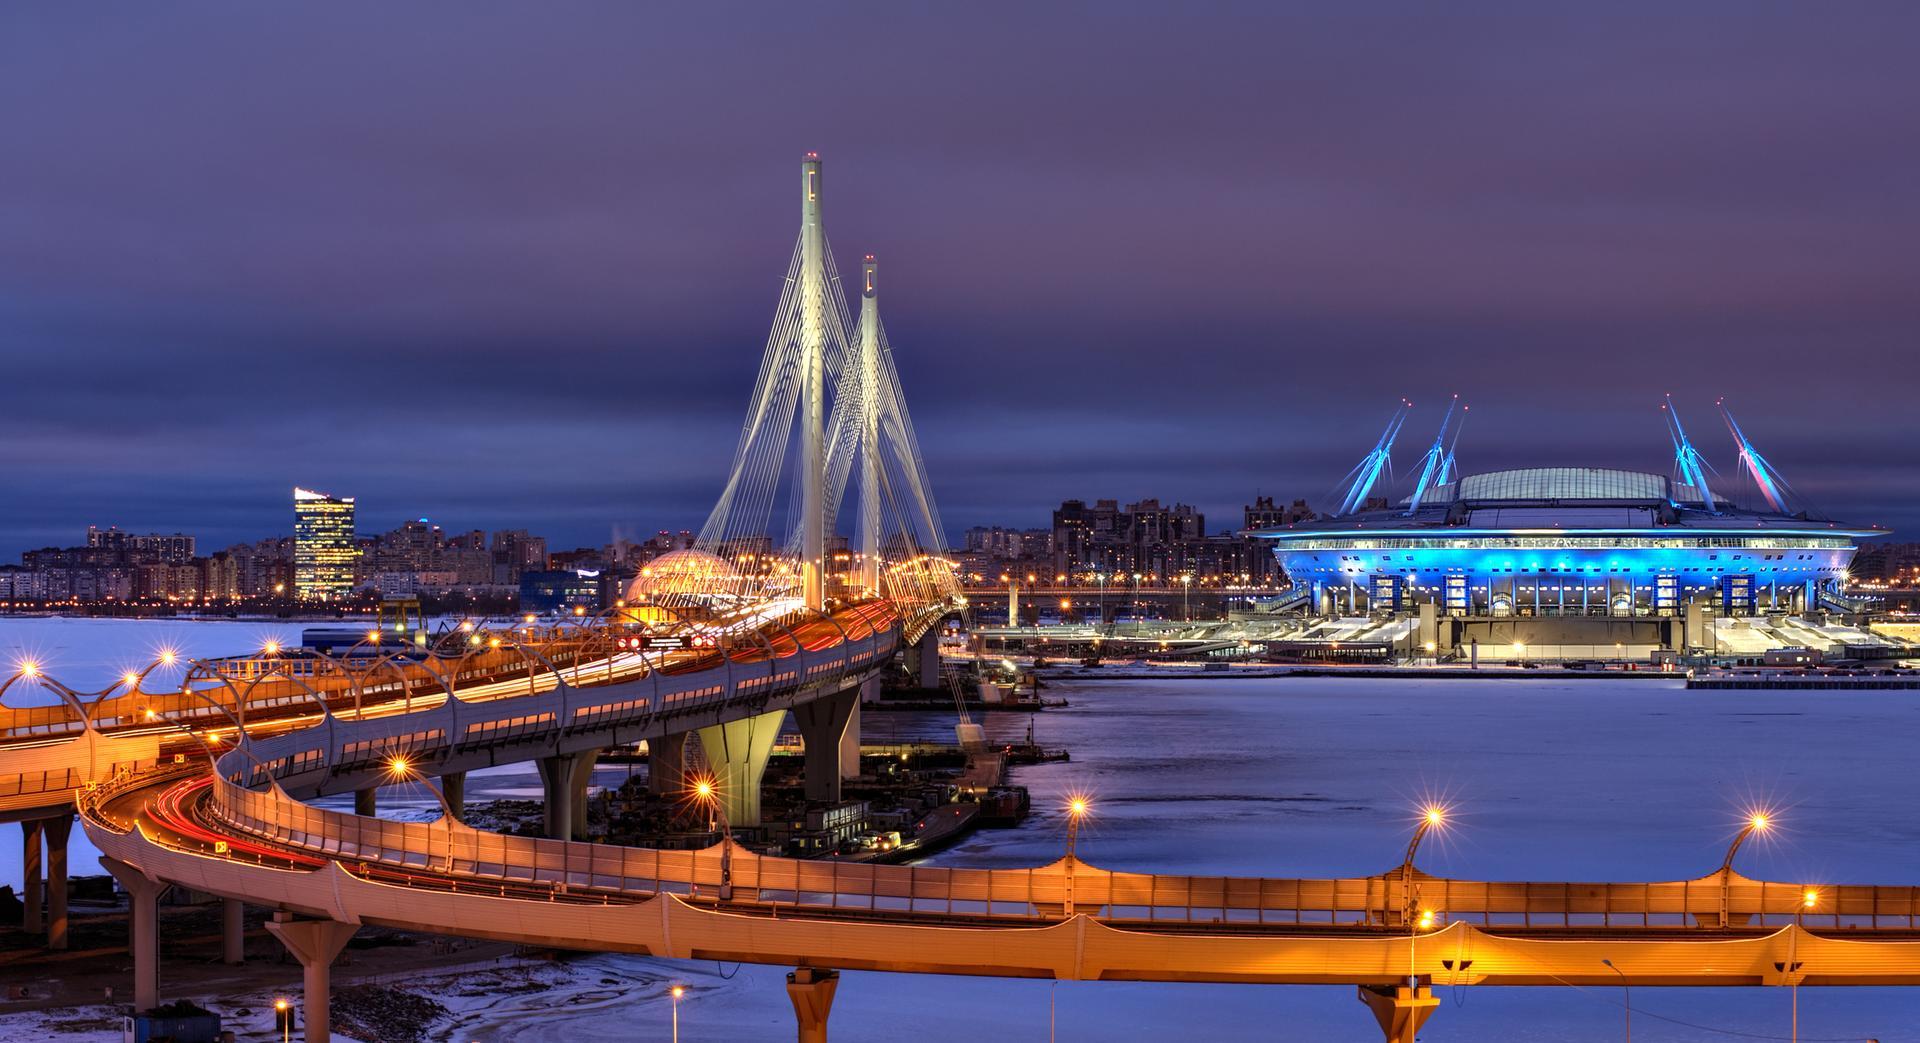 St Petersburg Ringstrasze iStock 637820542